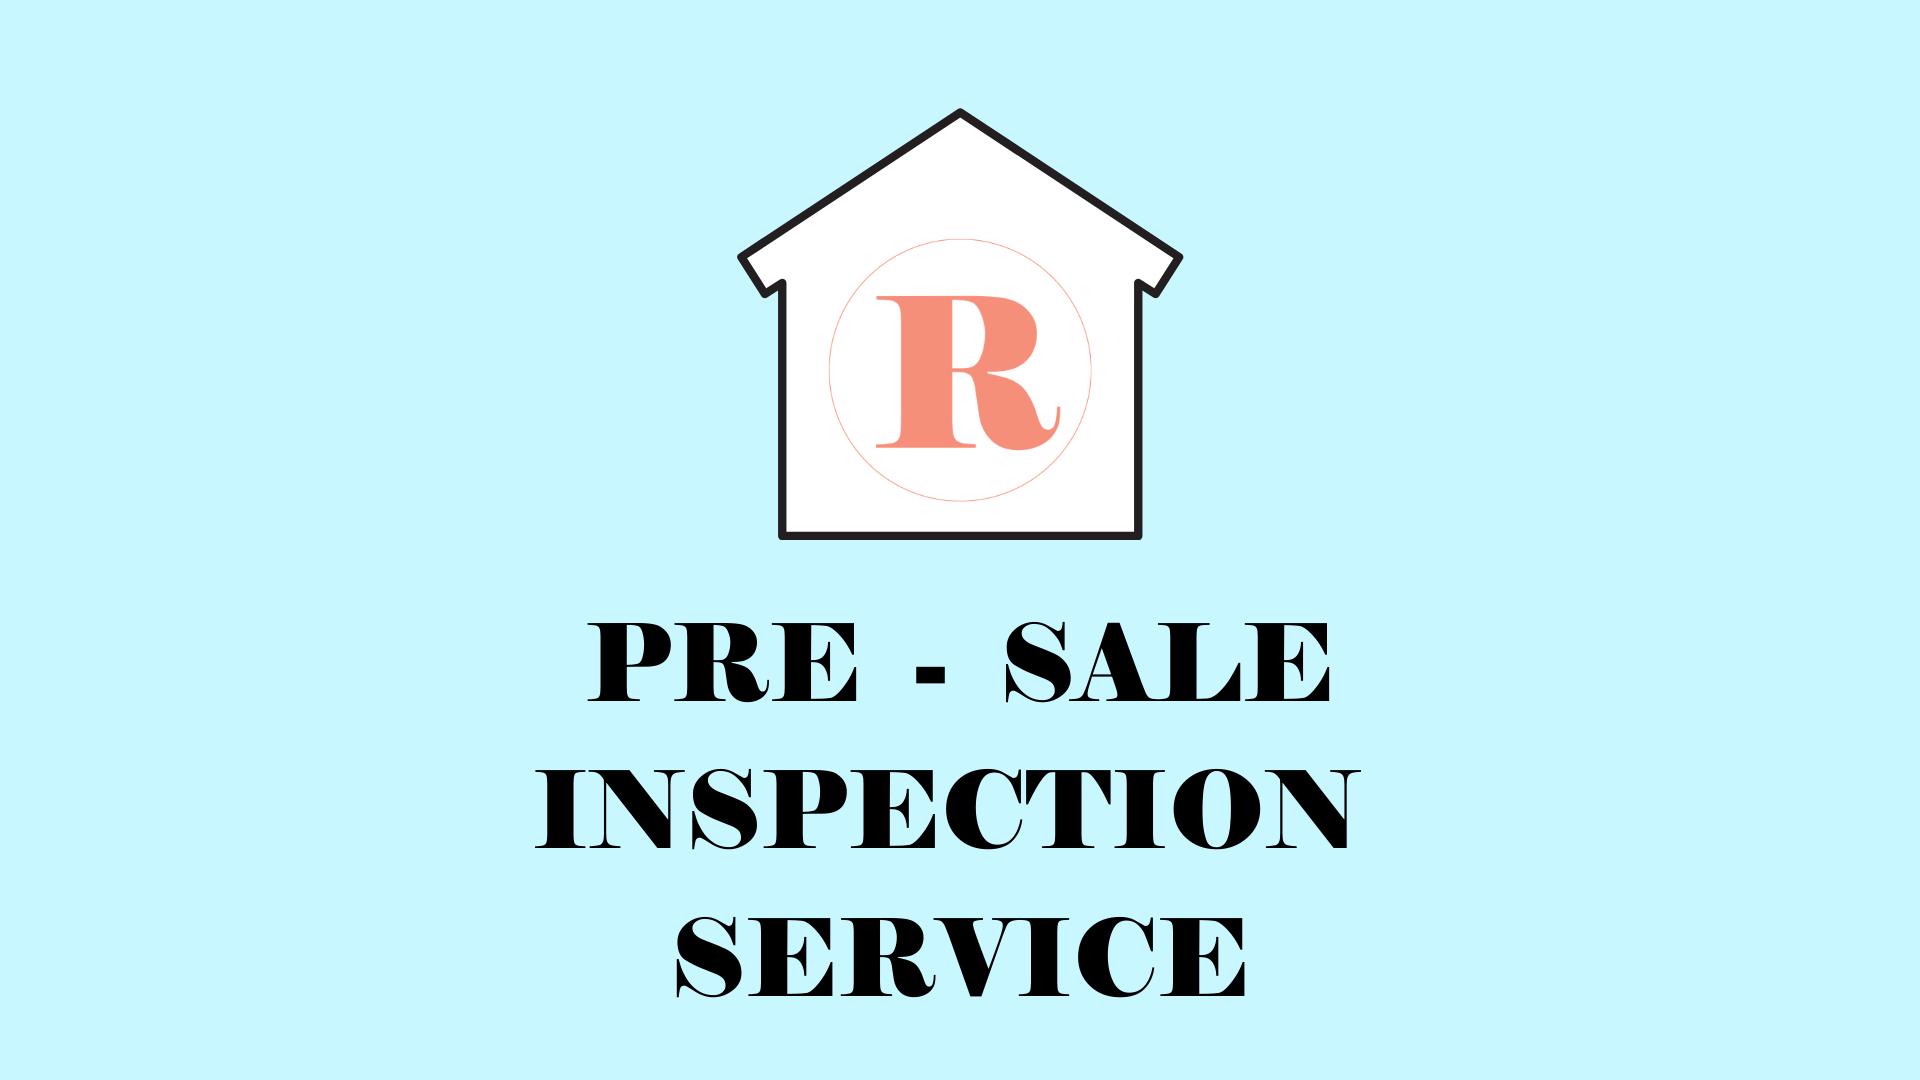 💻PRE SALE INSPECTION SERVICE